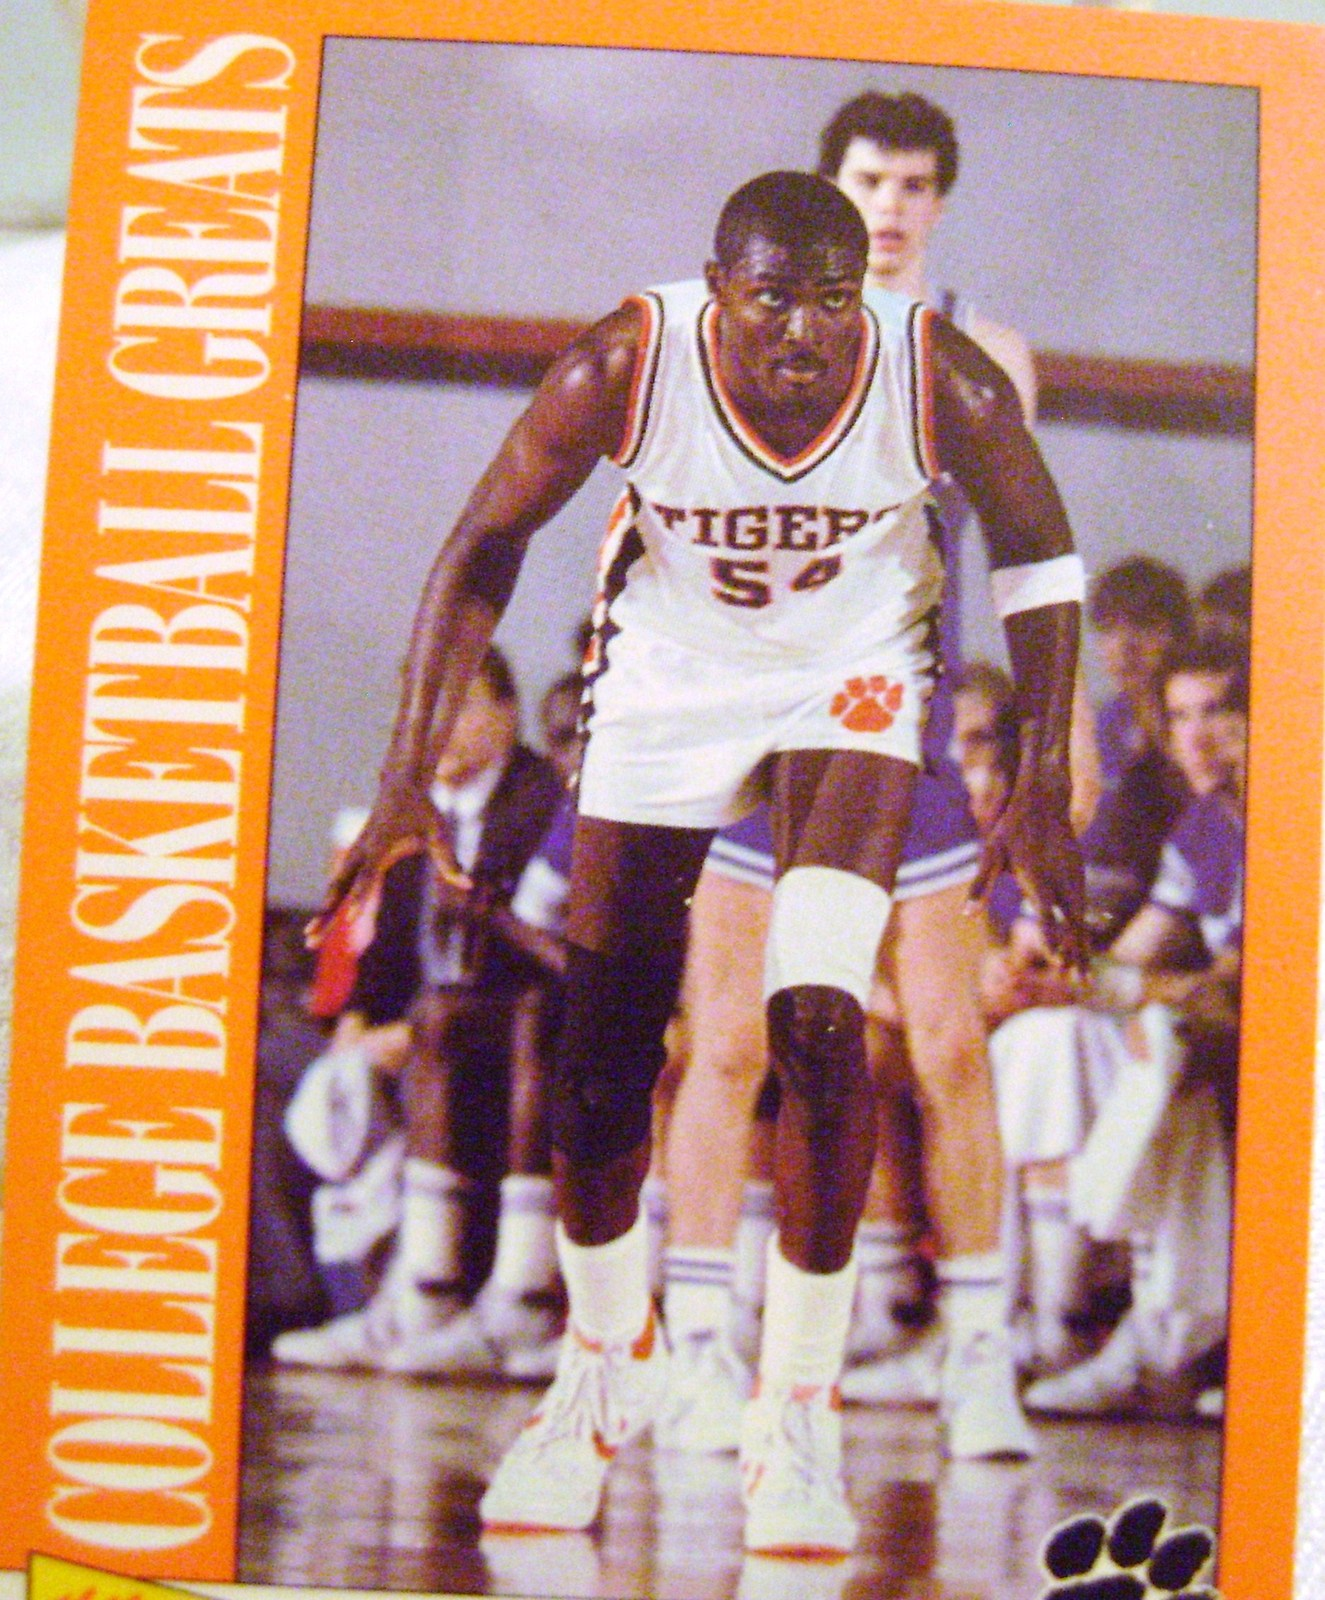 Kellogg's NBA Raisin Bran Trading Cards - 1992 College Greats